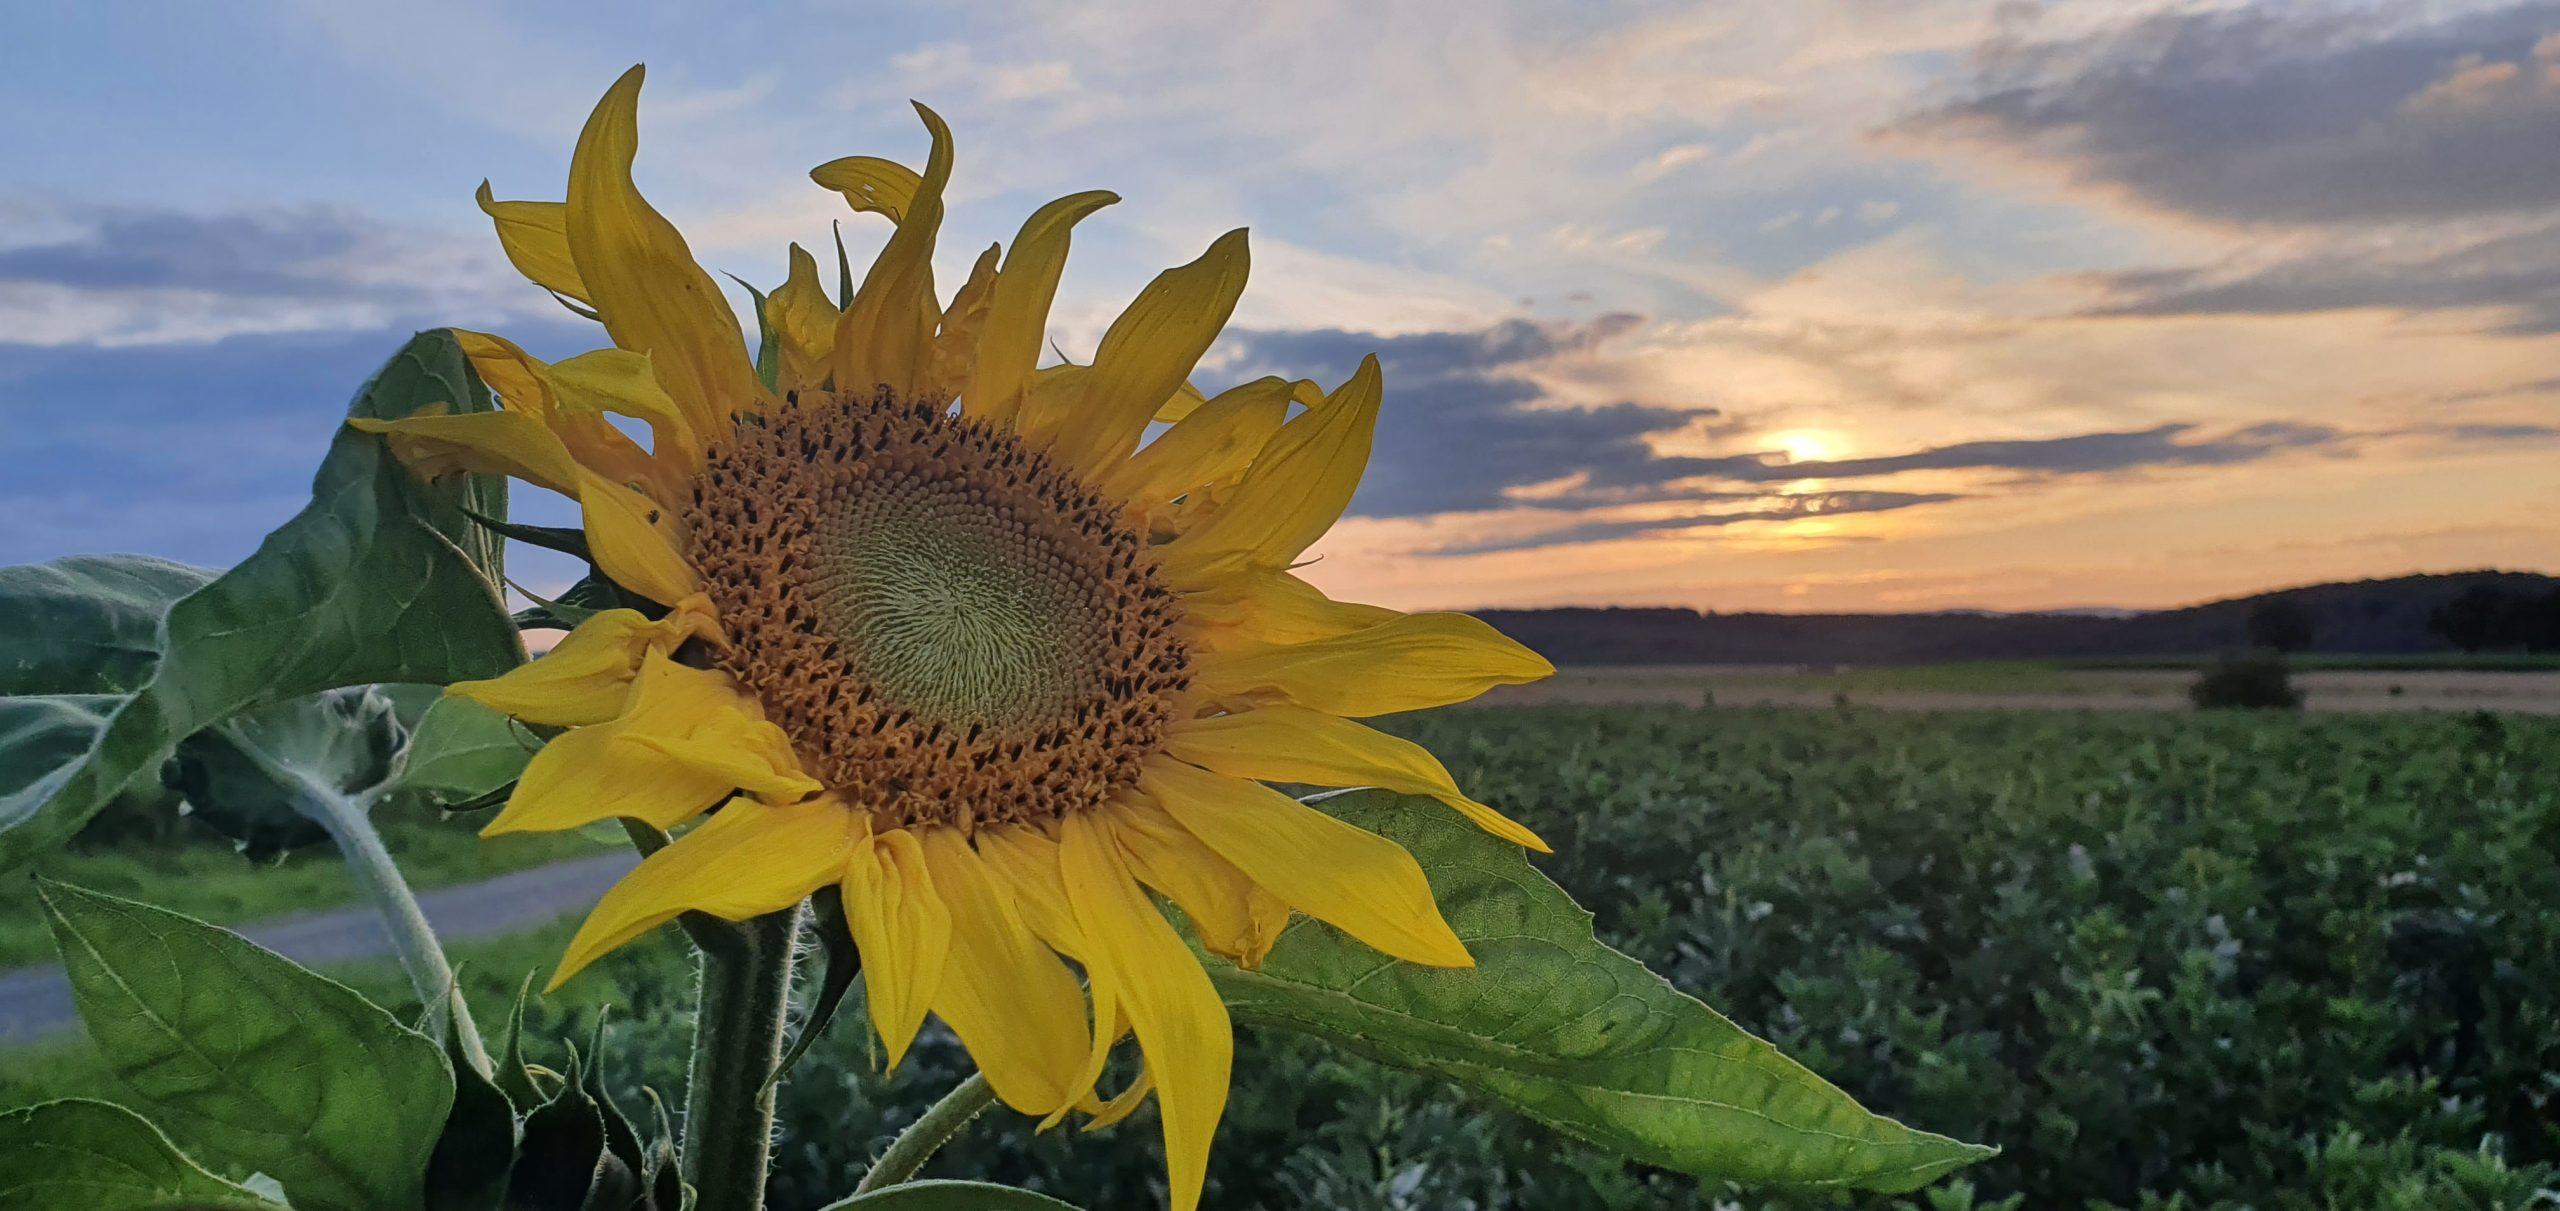 Sonnenblume im Sonnenuntergang